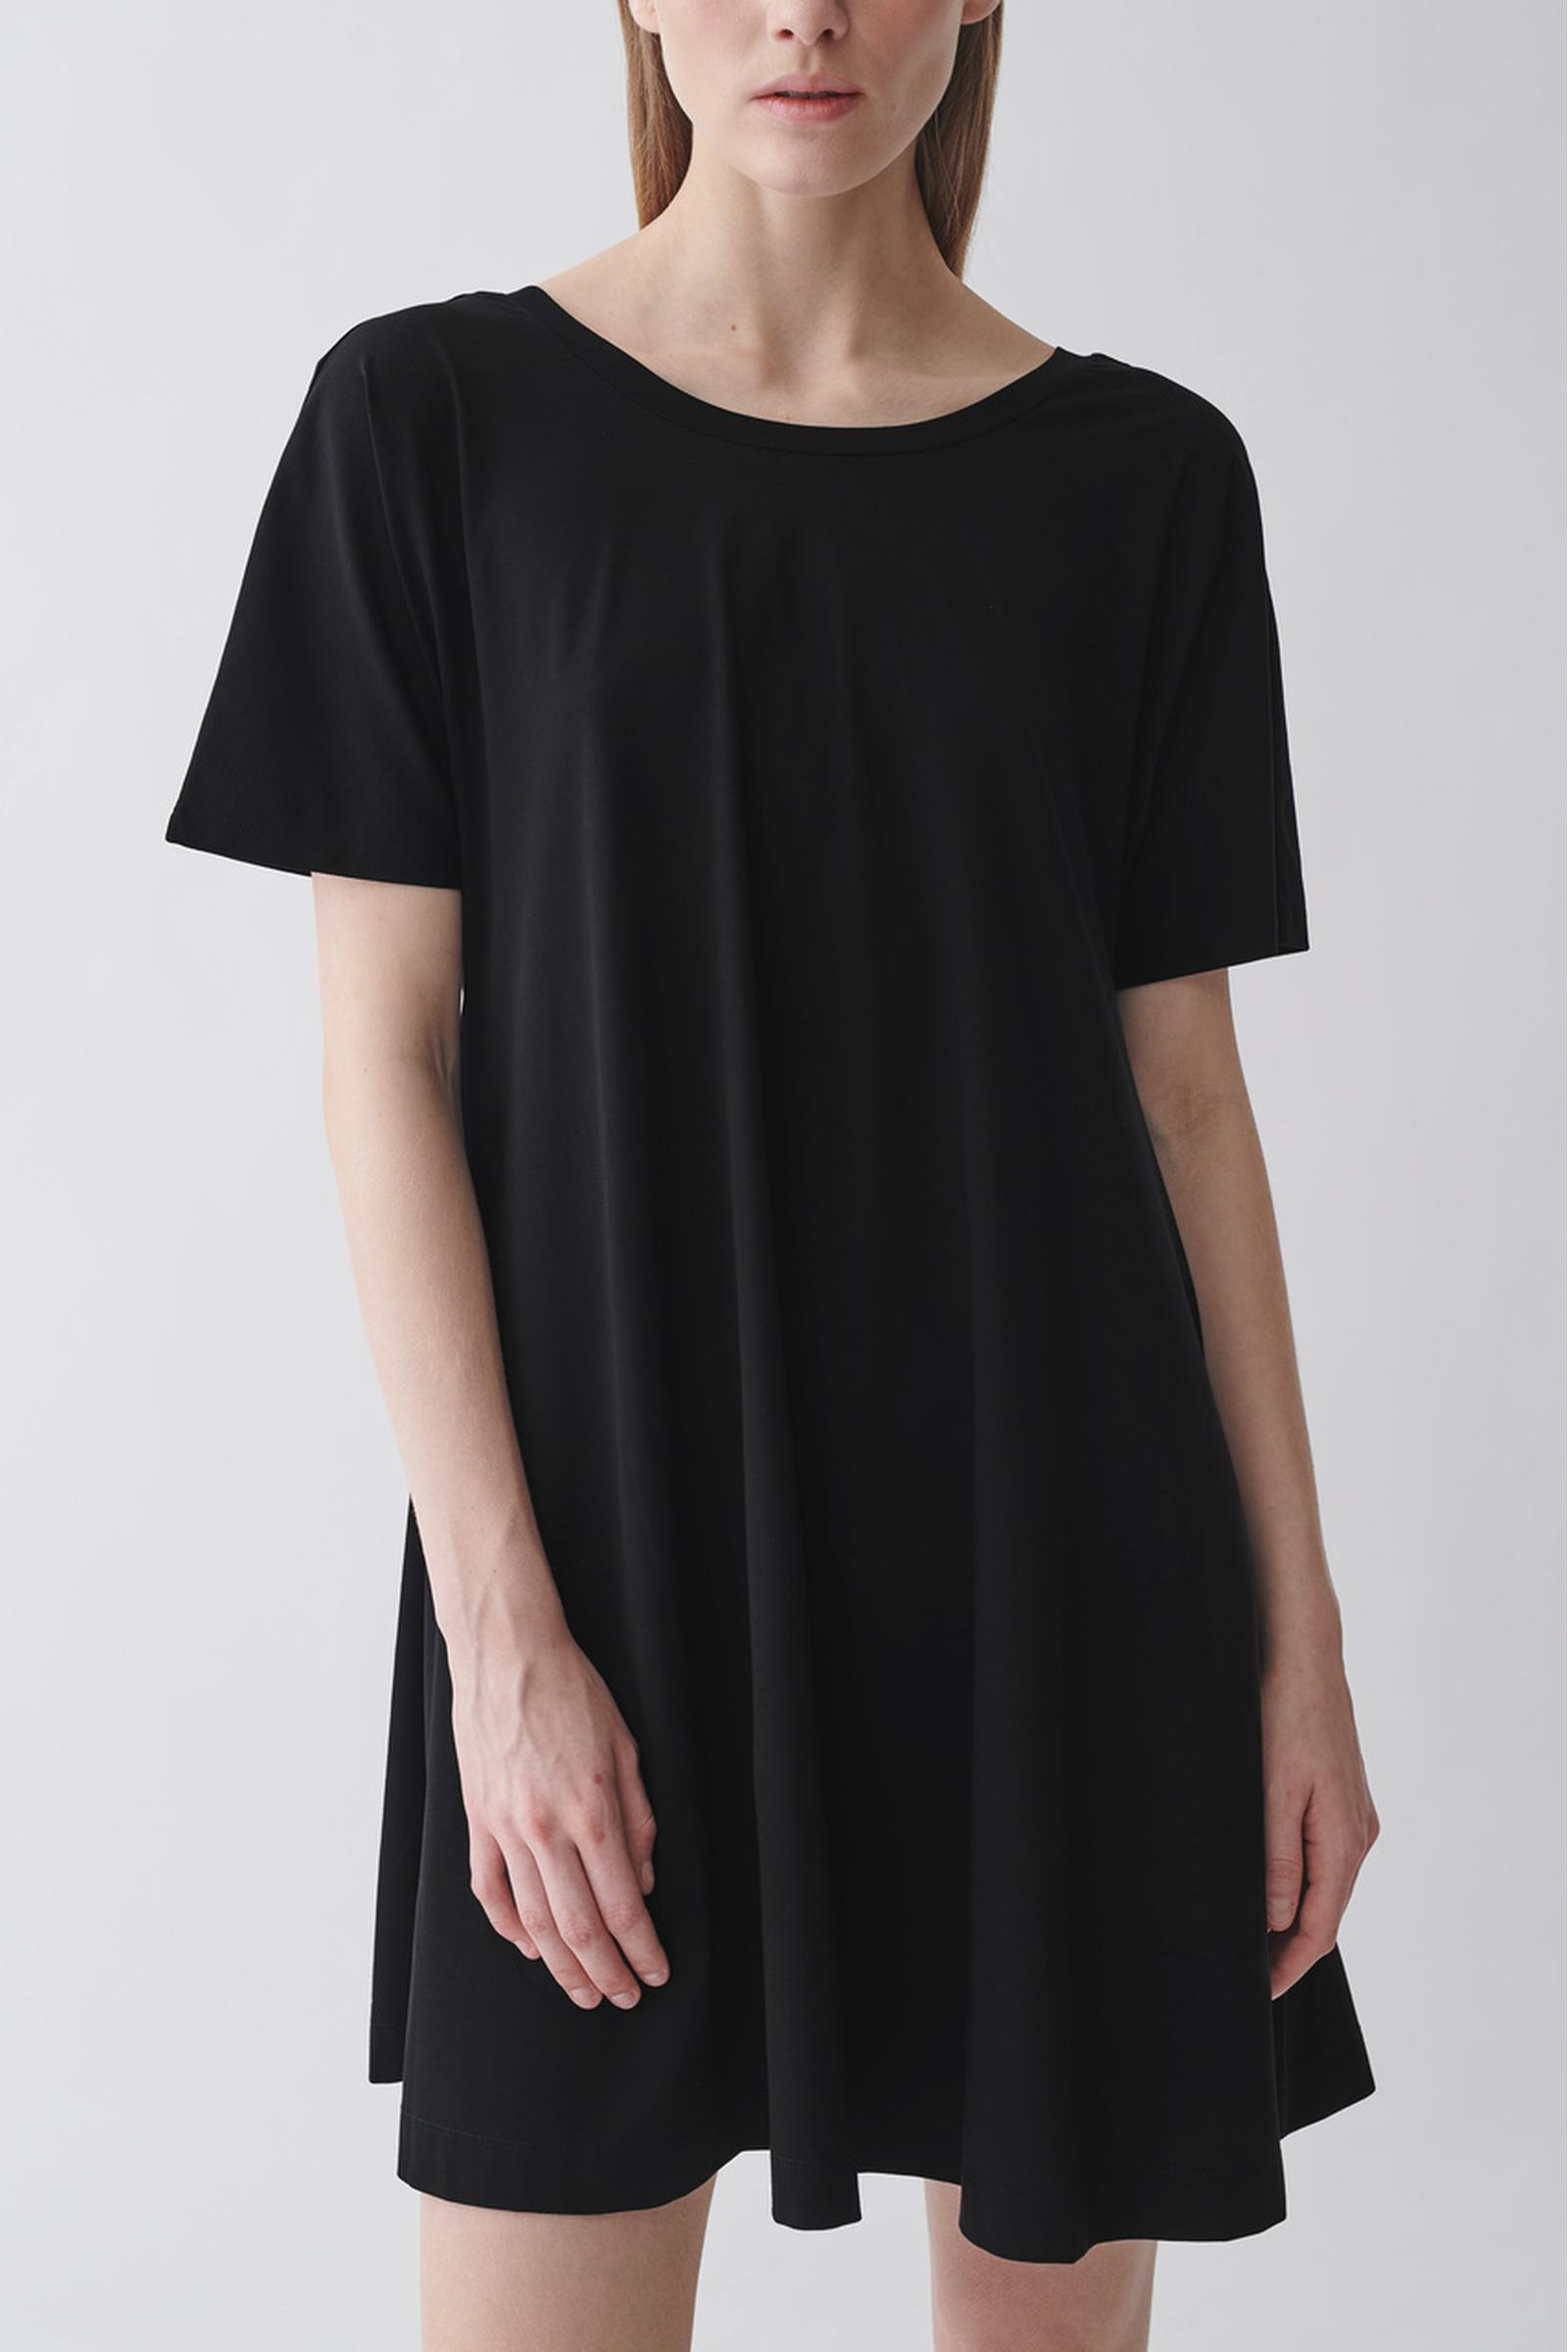 COS A라인 코튼 드레스의 블랙컬러 ECOMLook입니다.